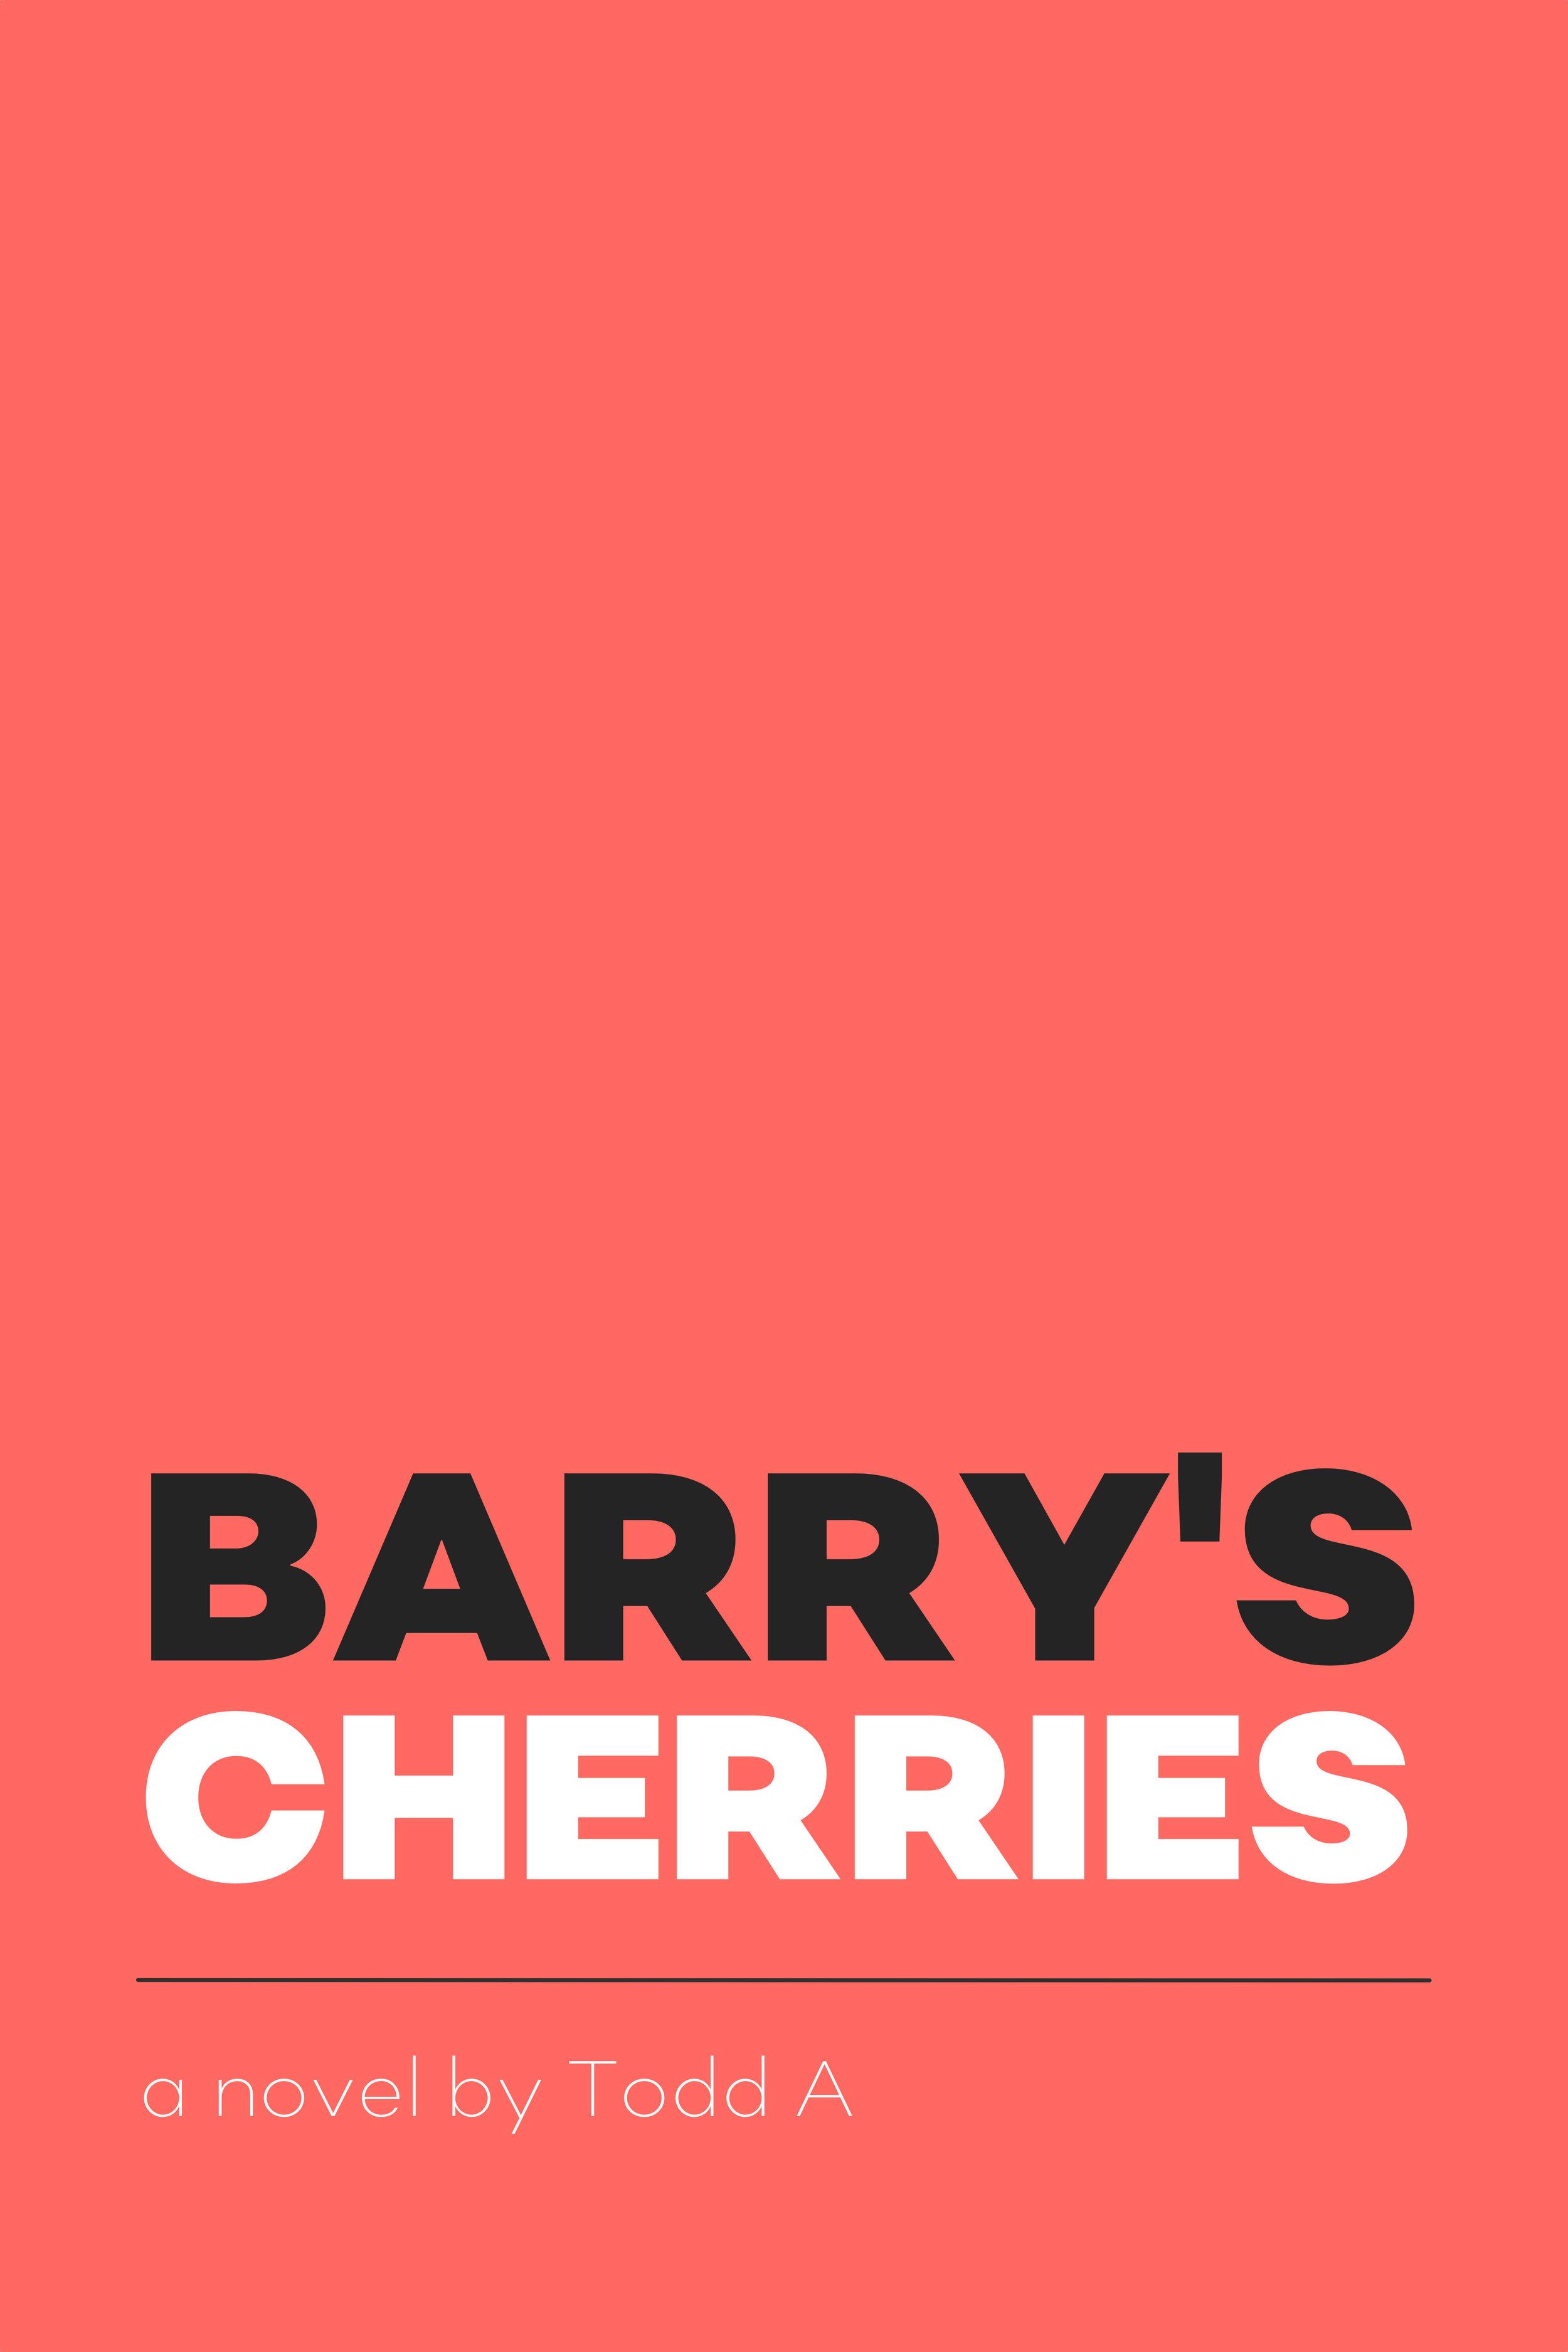 Barry's Cherries